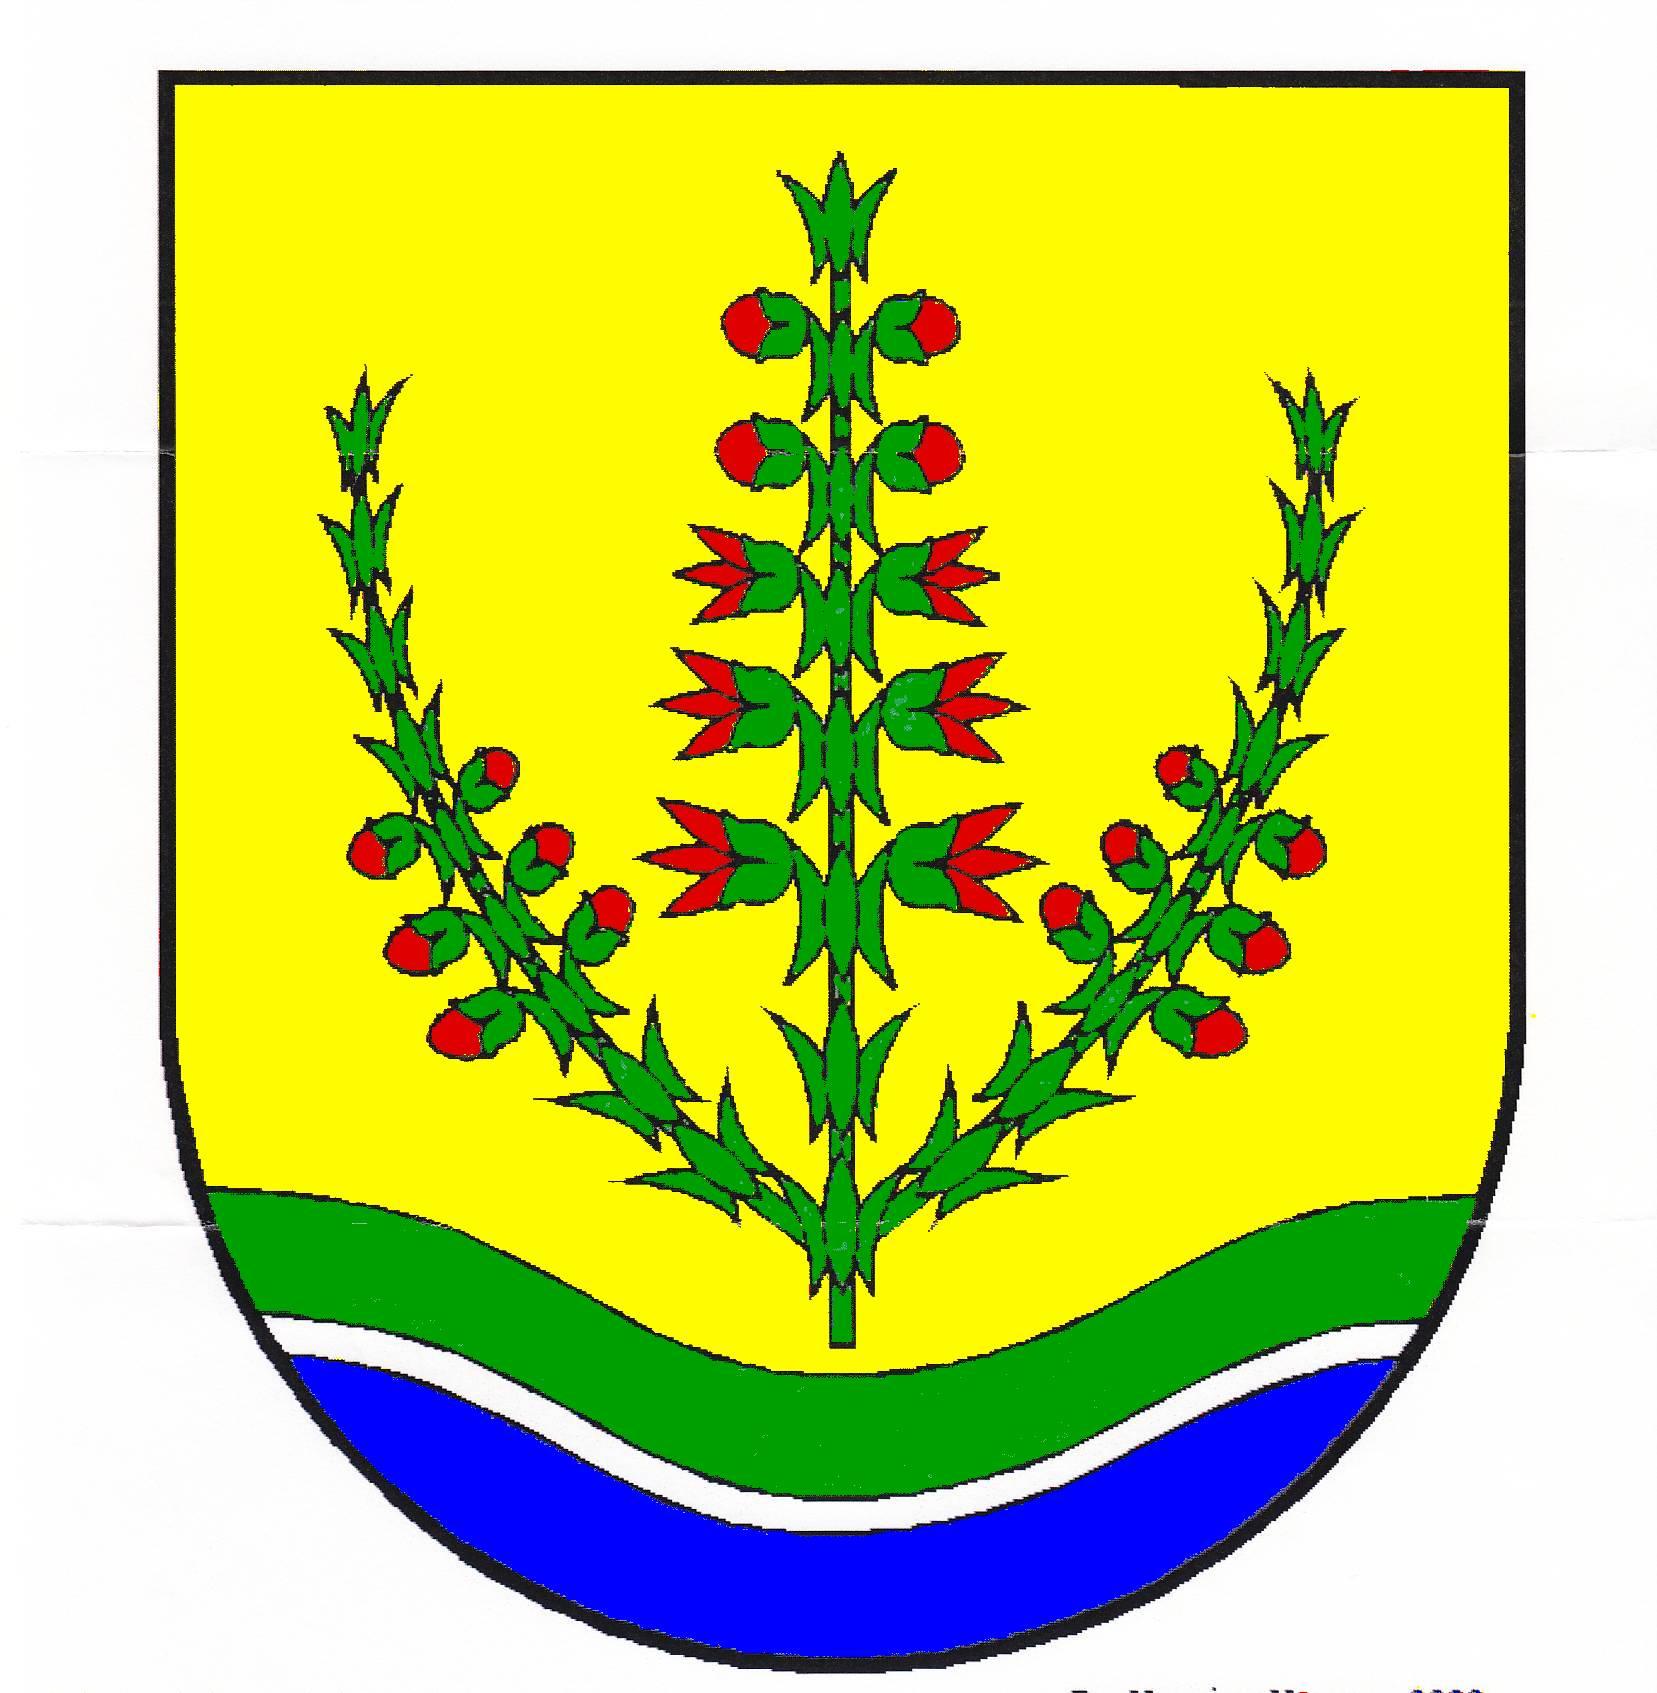 Wappen GemeindeGöhl, Kreis Ostholstein